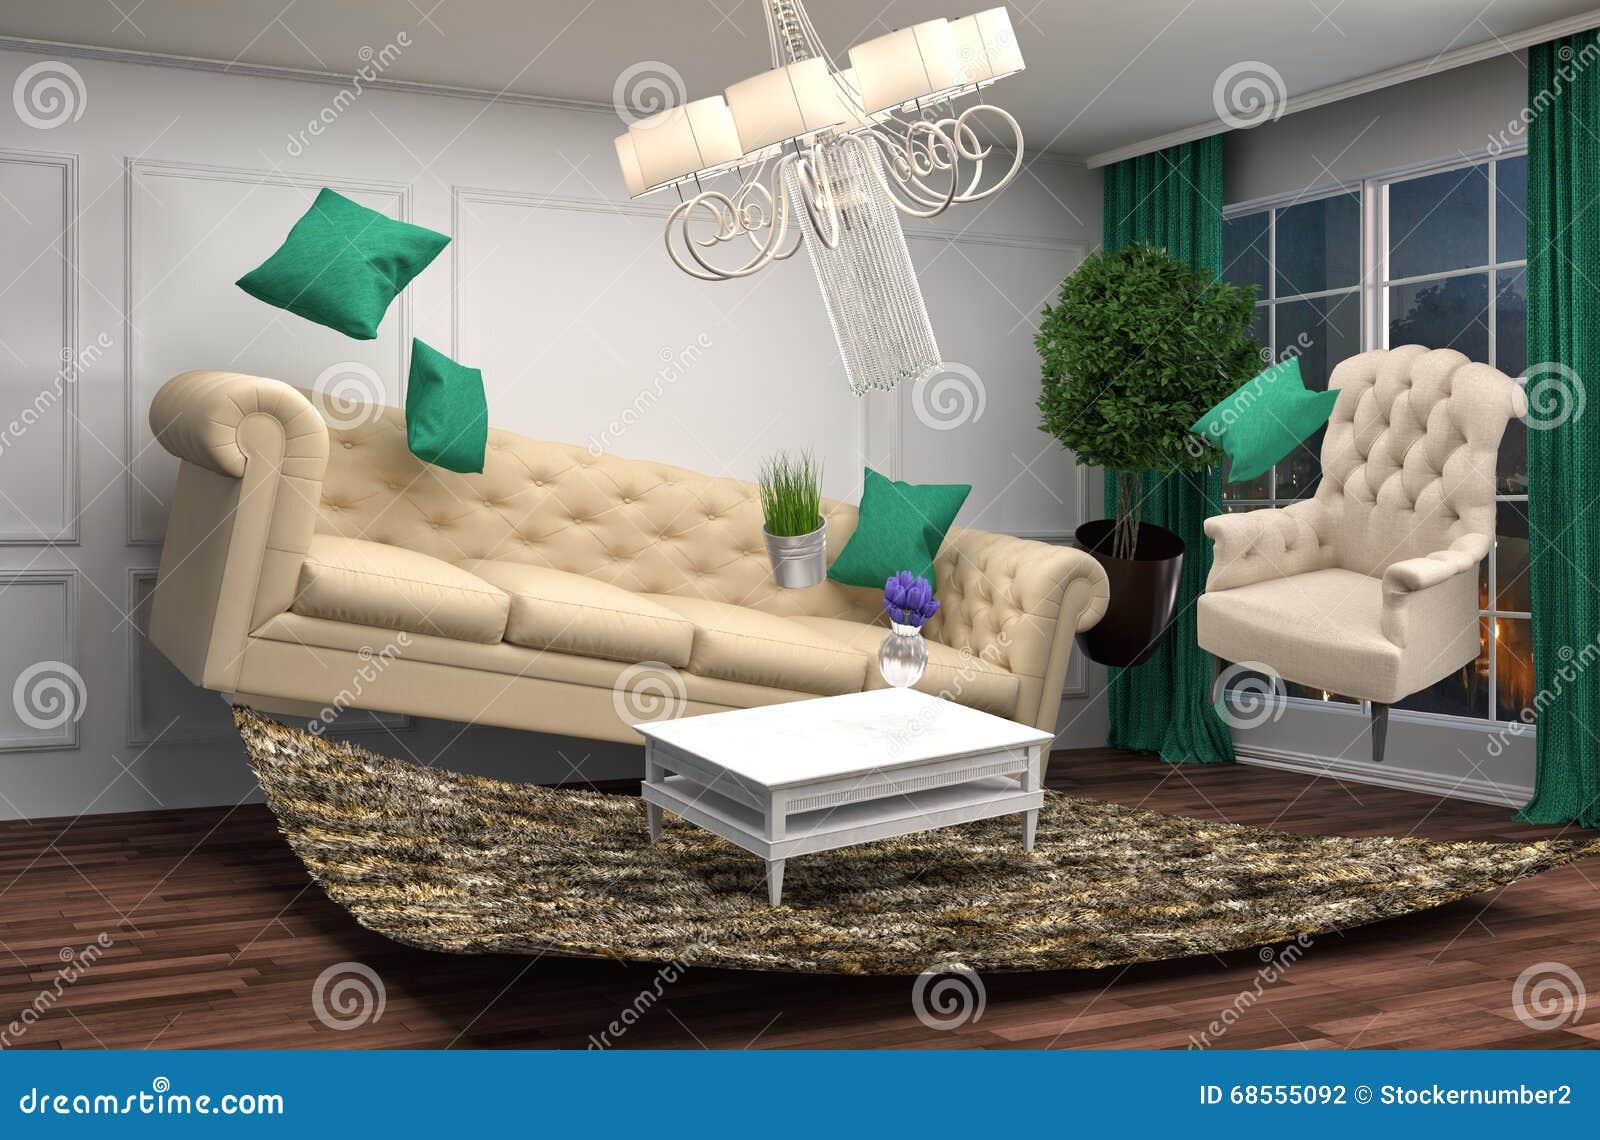 Living Room Zero Gravity Chair Zion Star